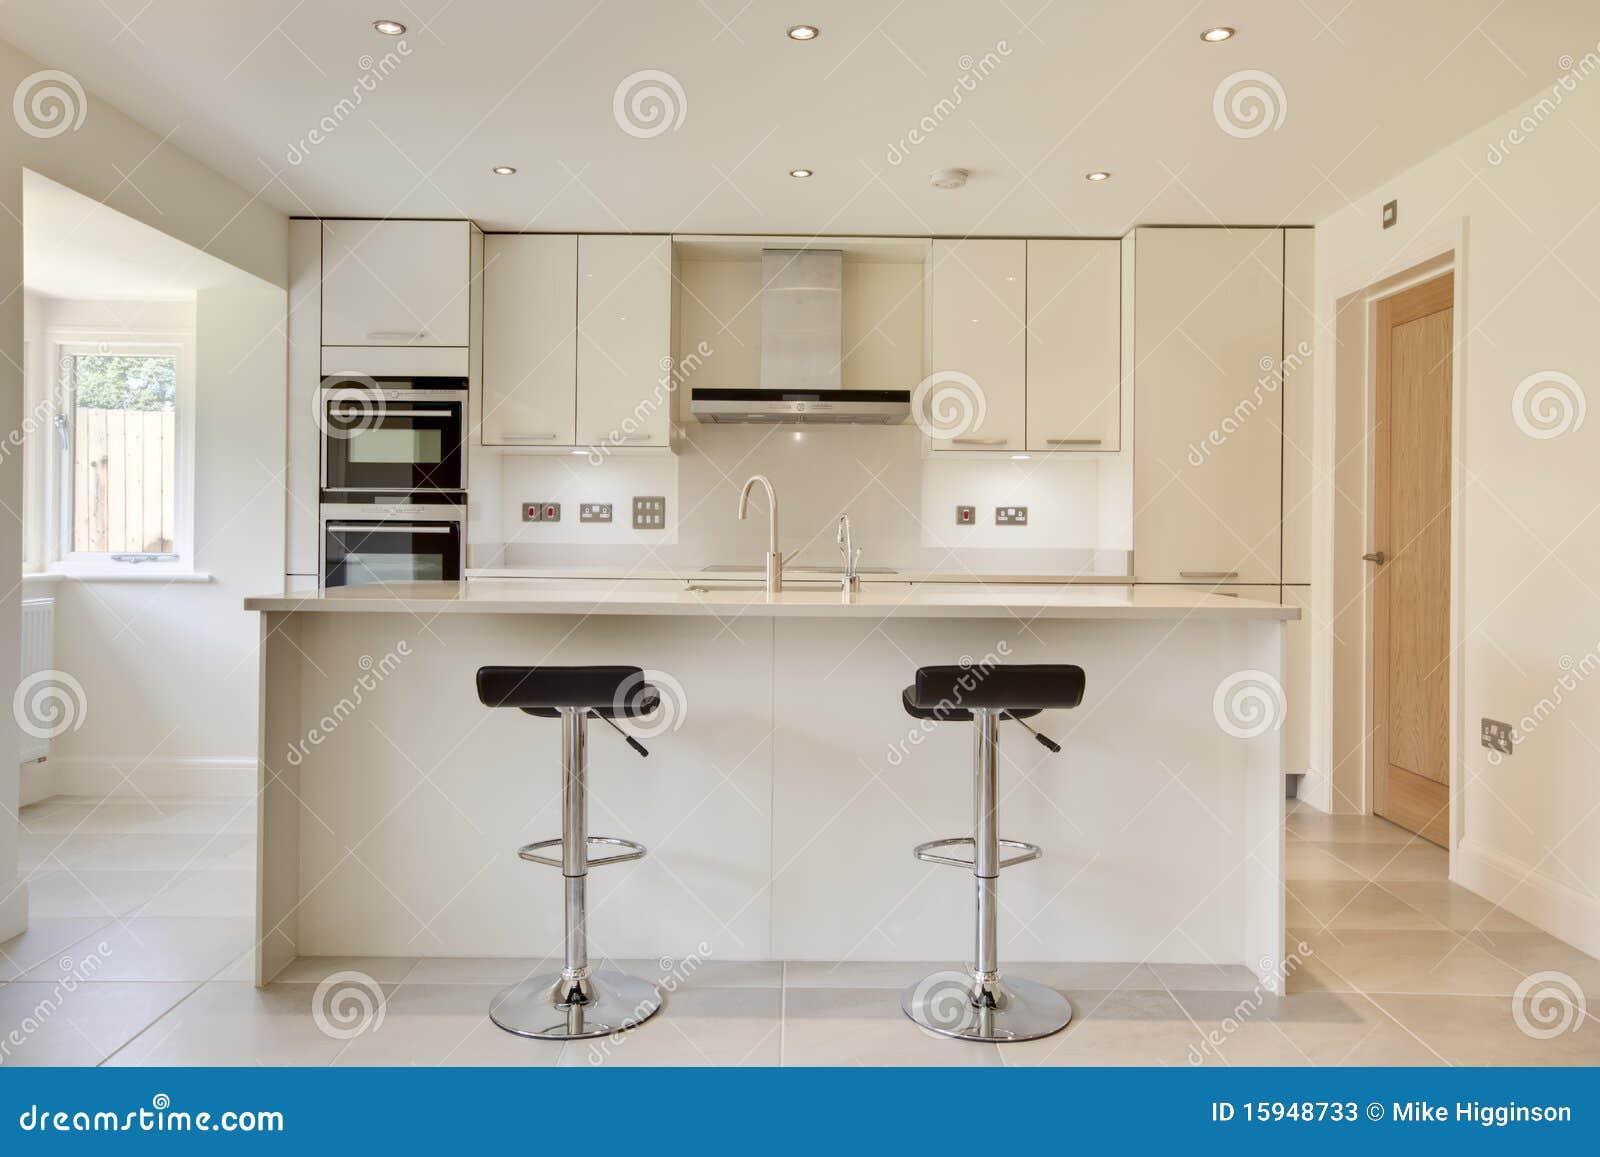 Cucina moderna contemporanea immagine stock immagine for Cucina moderna contemporanea